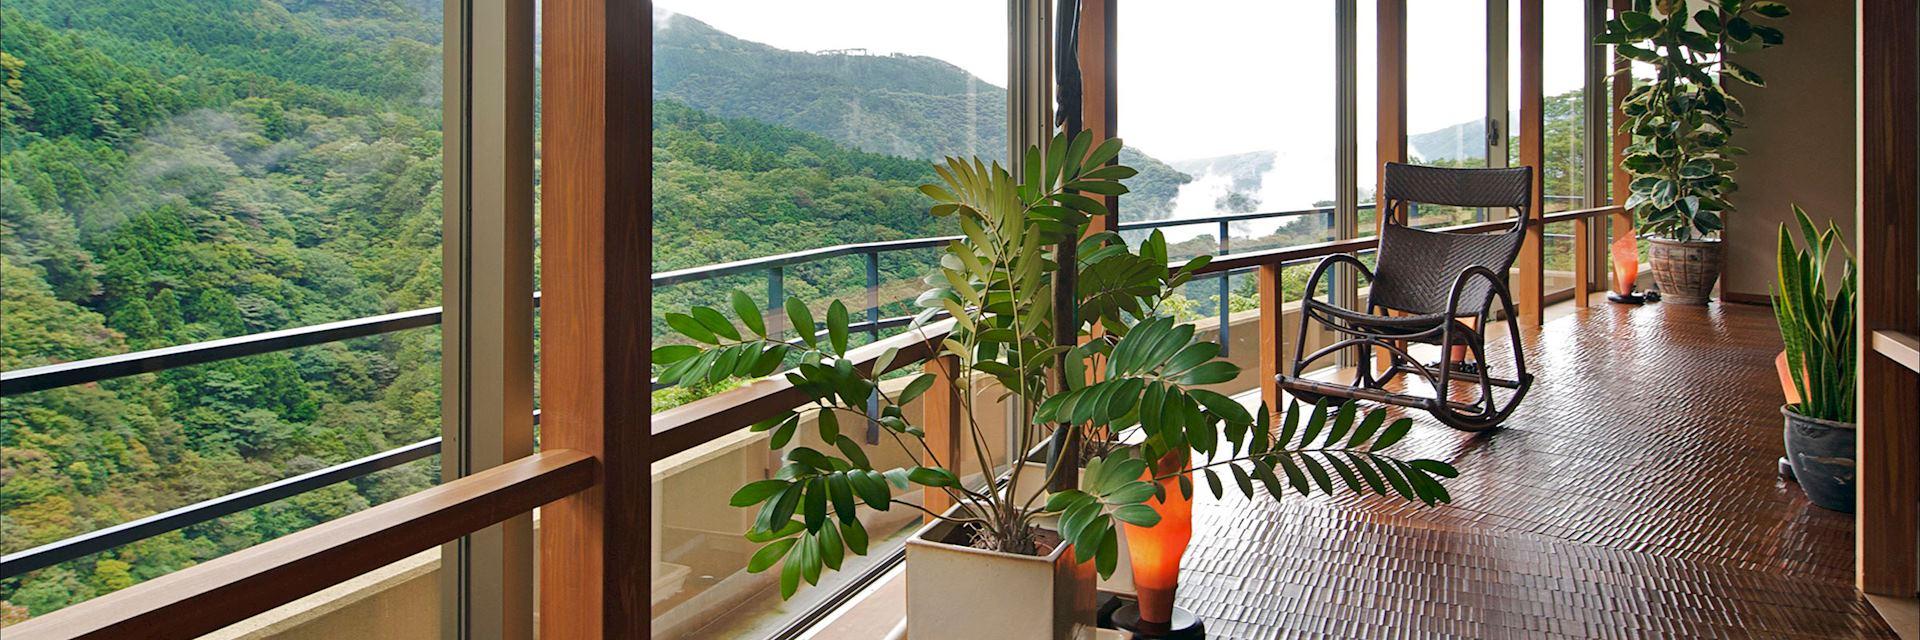 Hakone Ginyu Spa Resort